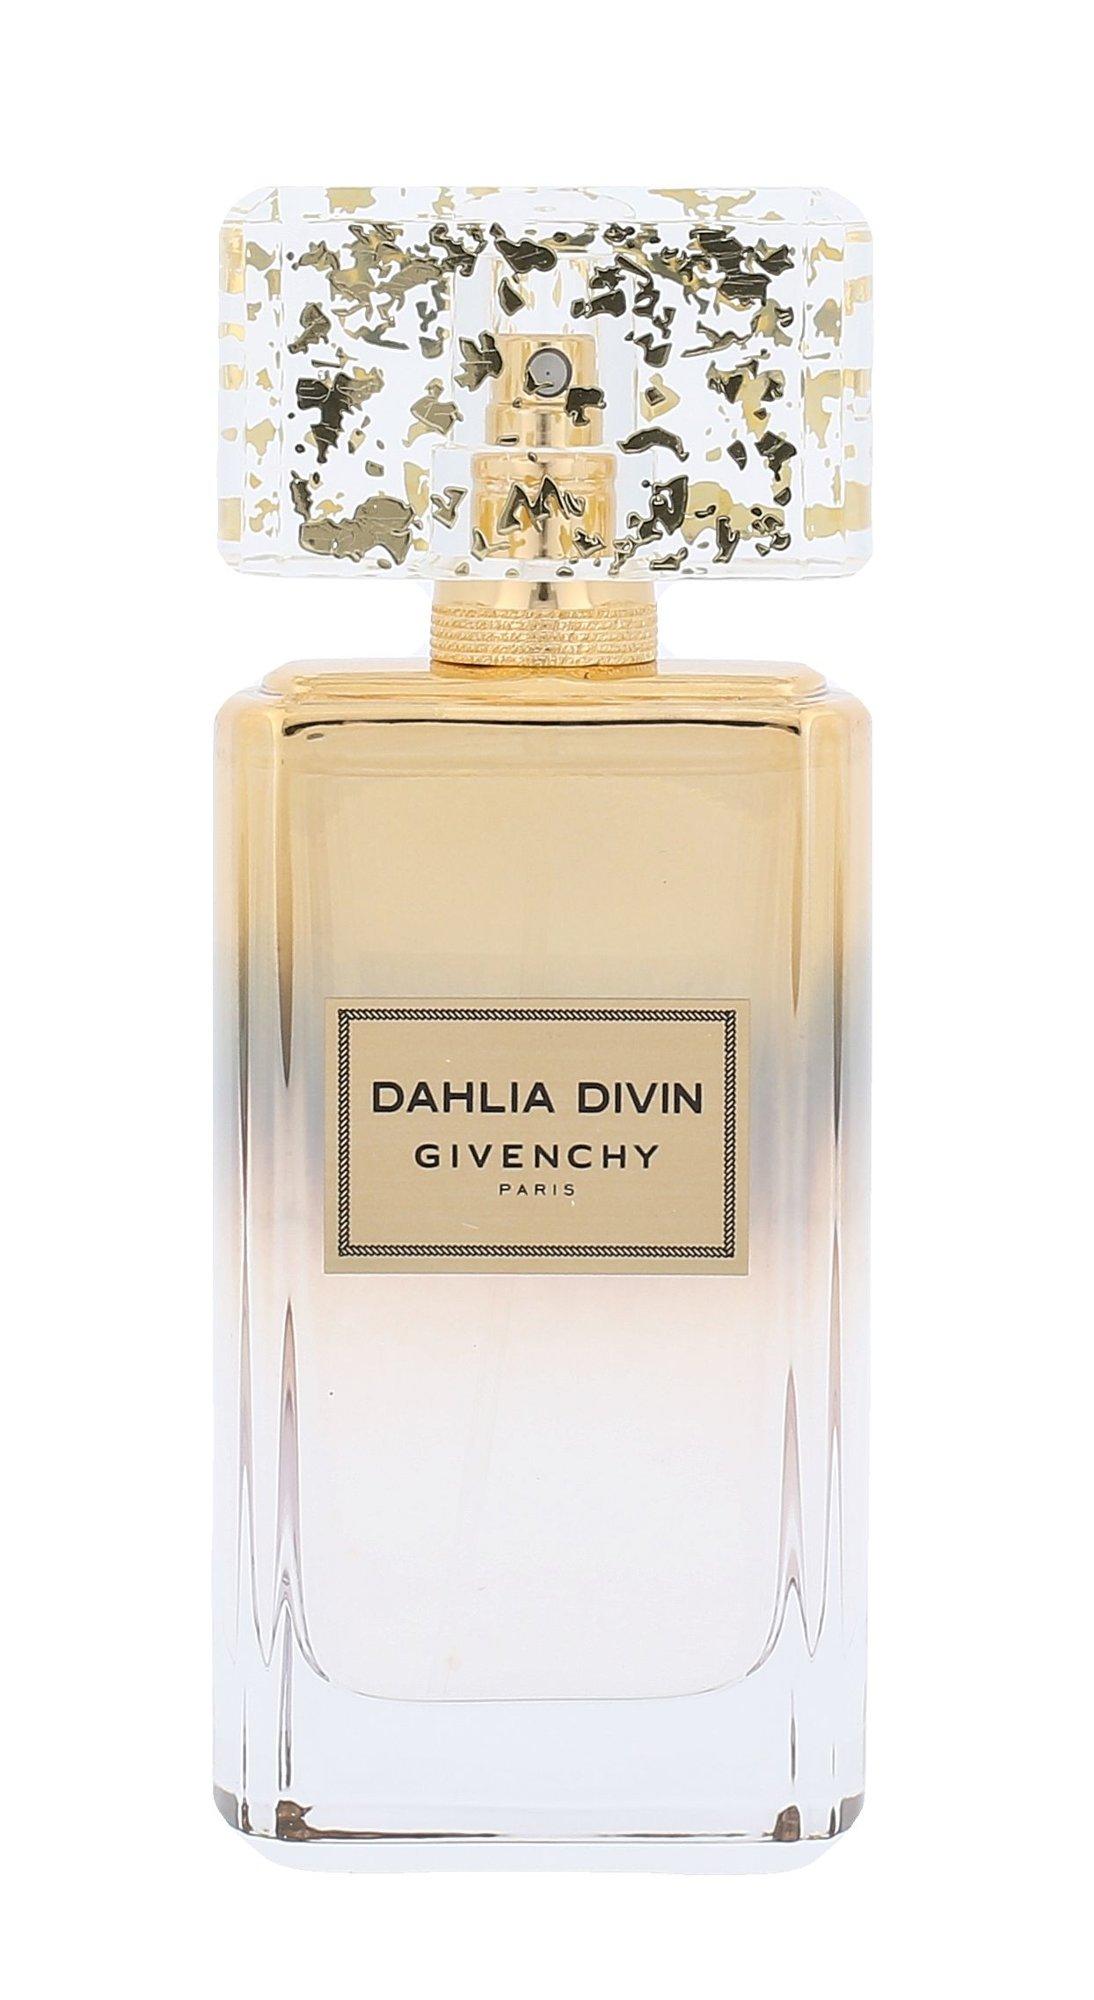 Givenchy Dahlia Divin EDP 30ml  Le Nectar de Parfum